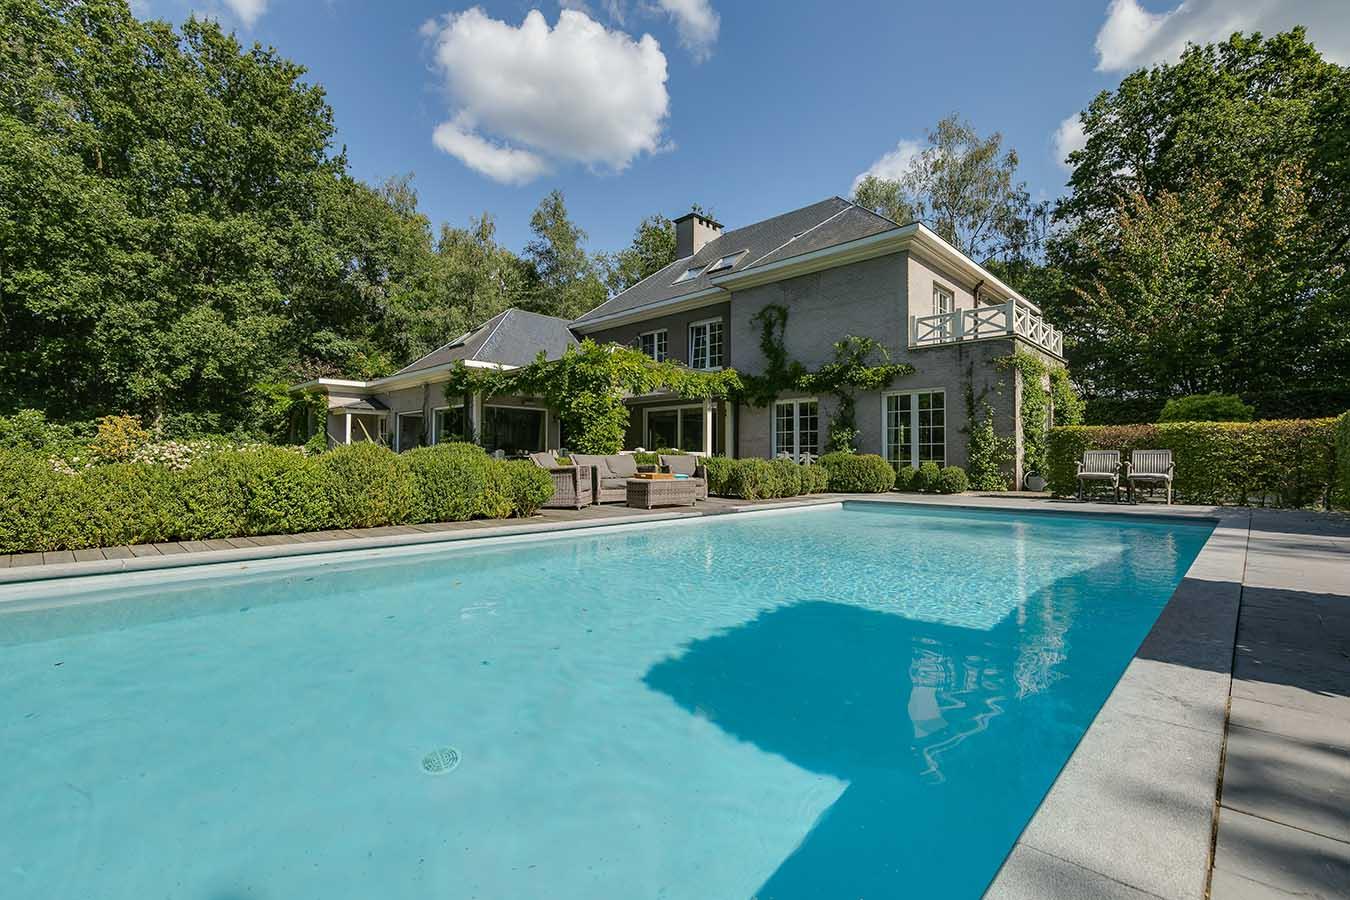 zwembad naast een woning